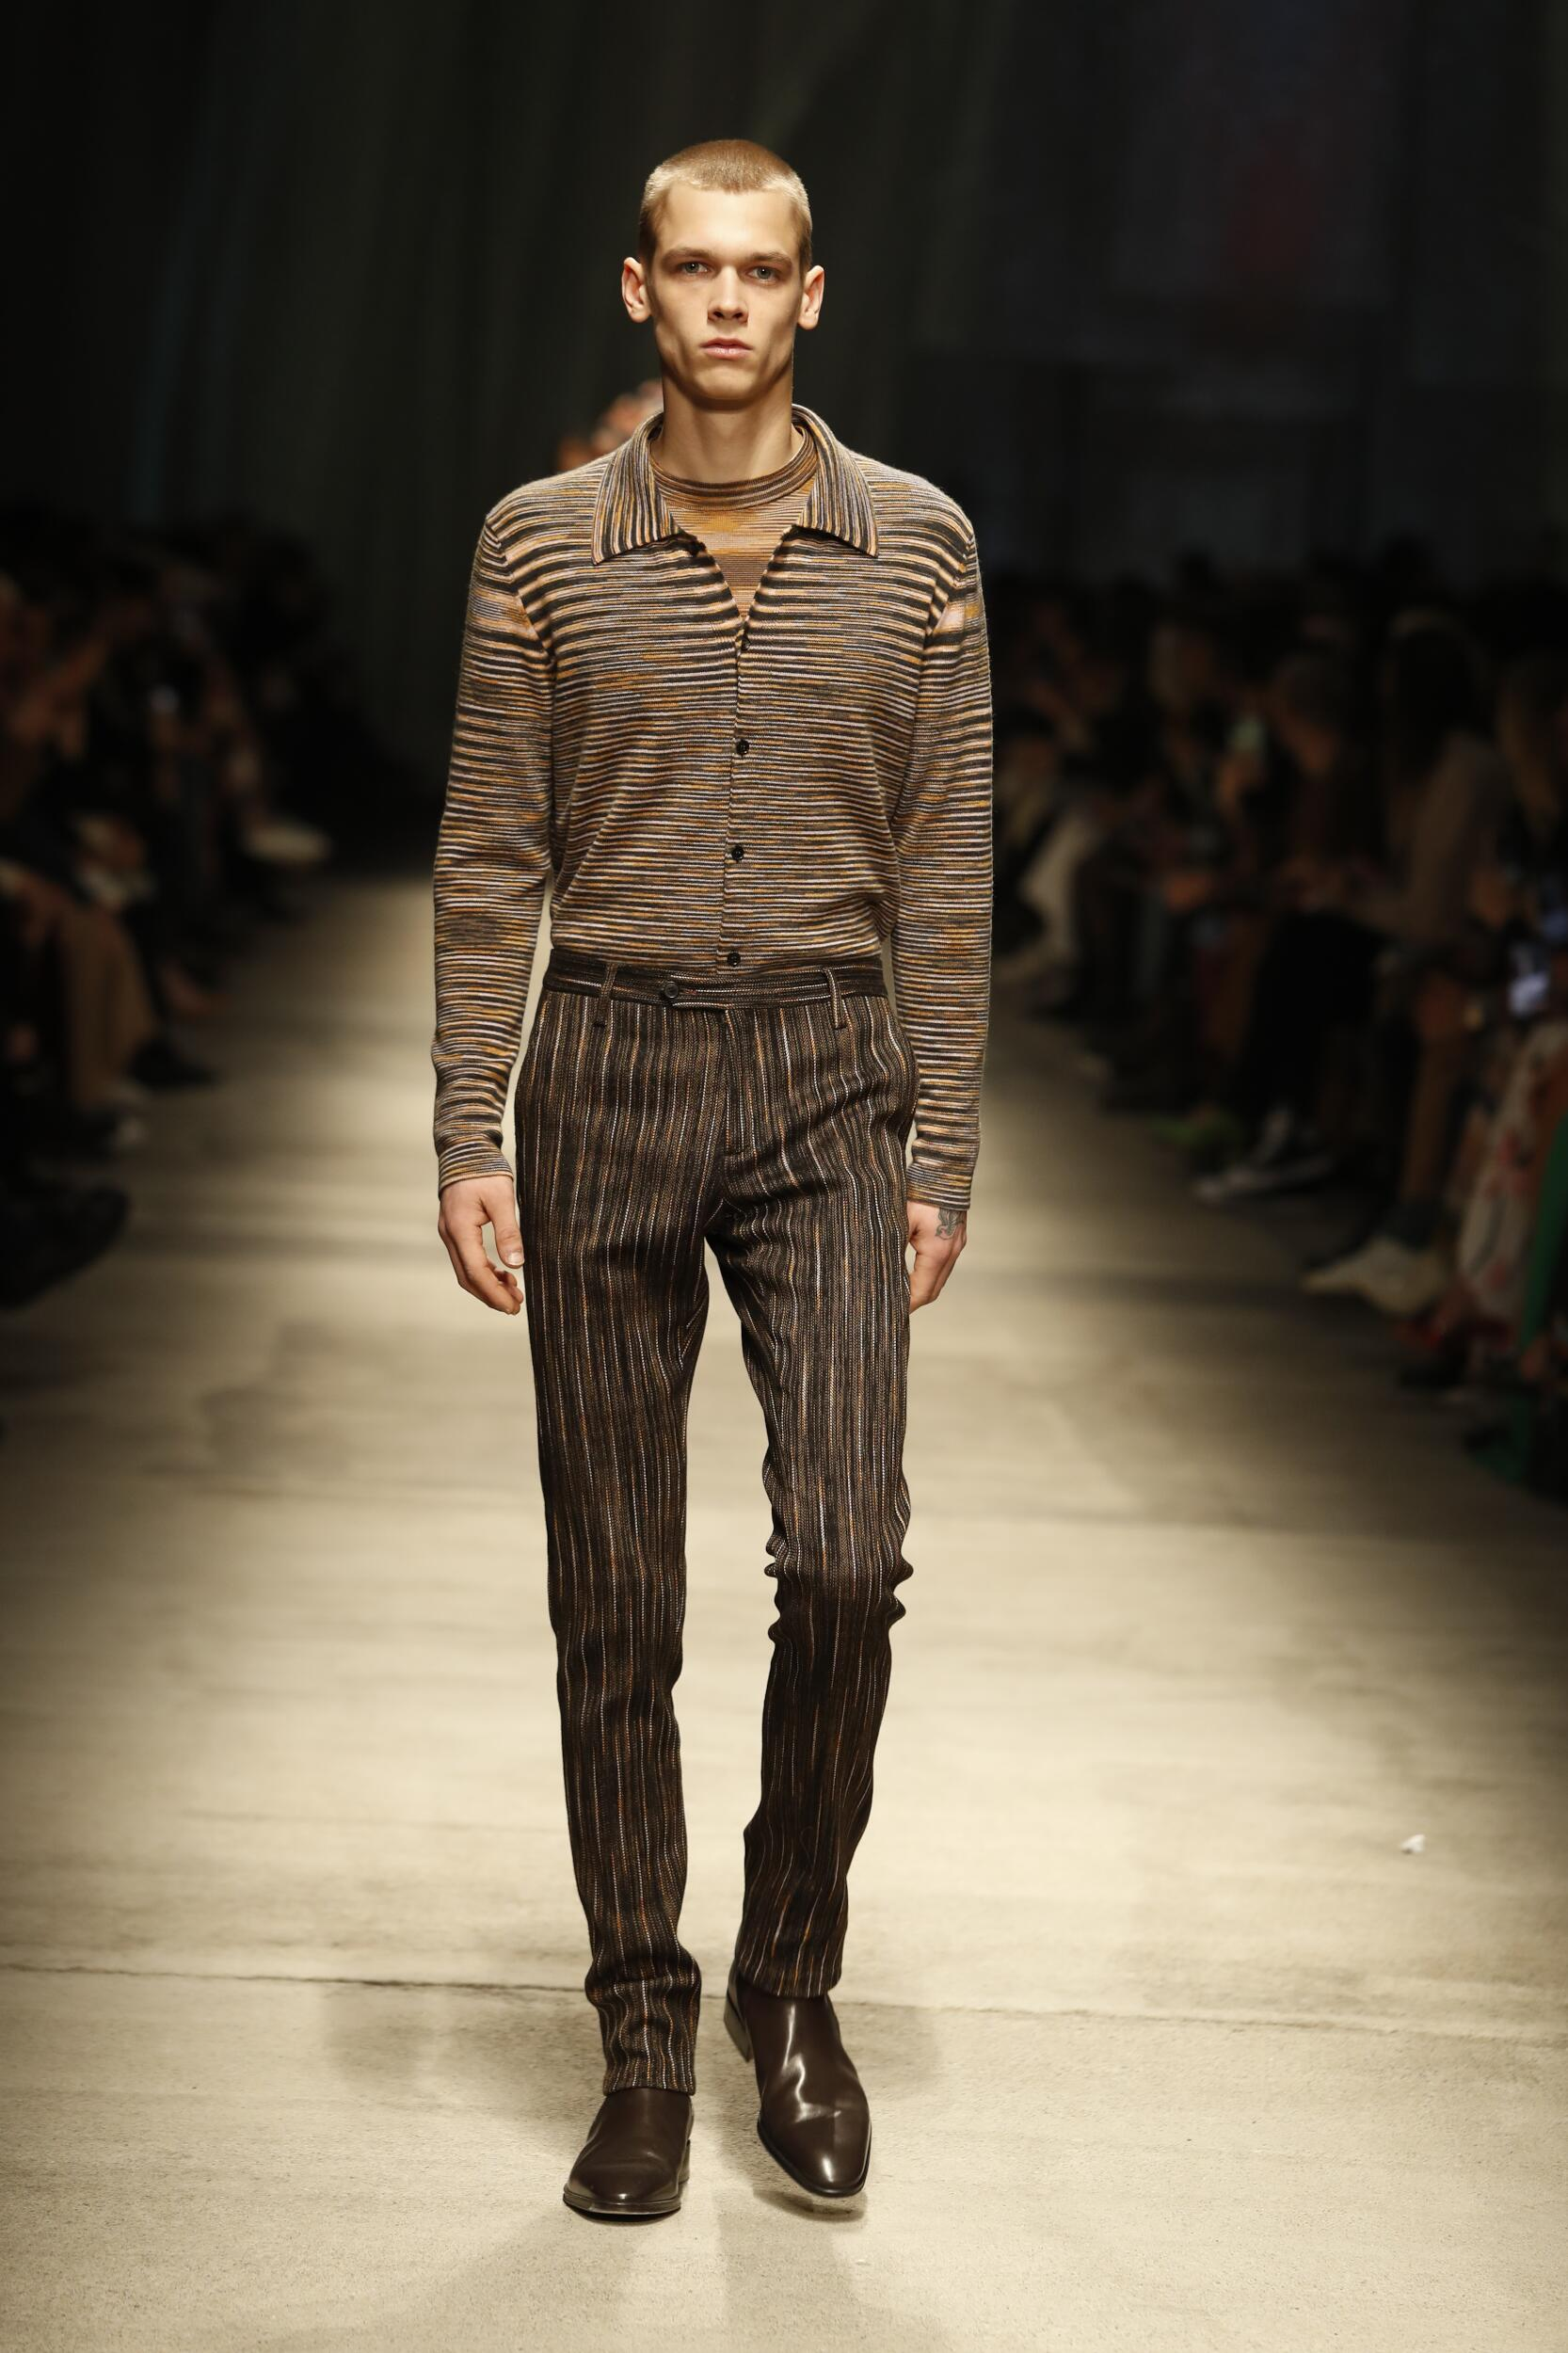 Missoni FW 2020 Menswear